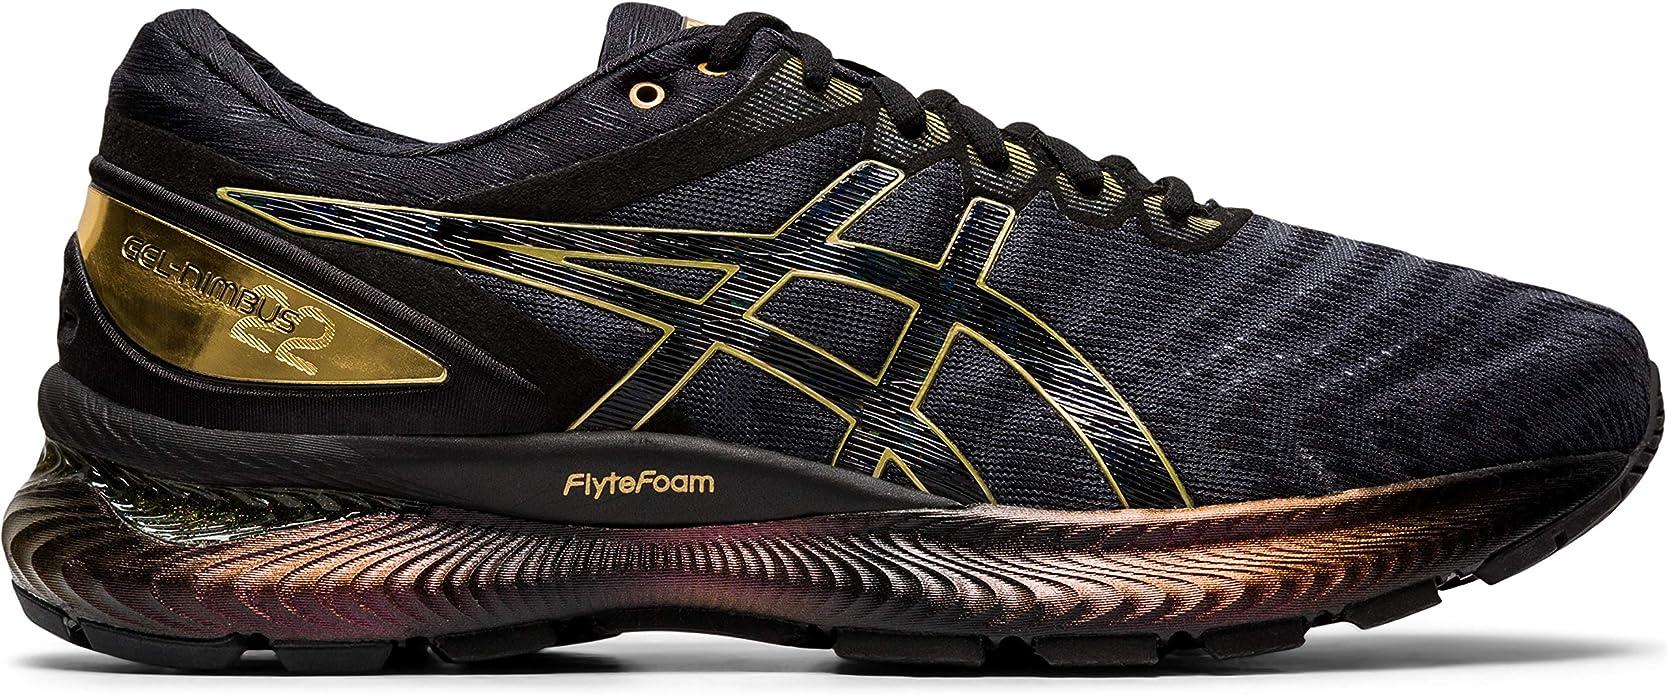 ASICS Gel-Nimbus 22 Platinum Zapatillas para Correr - SS20 ...